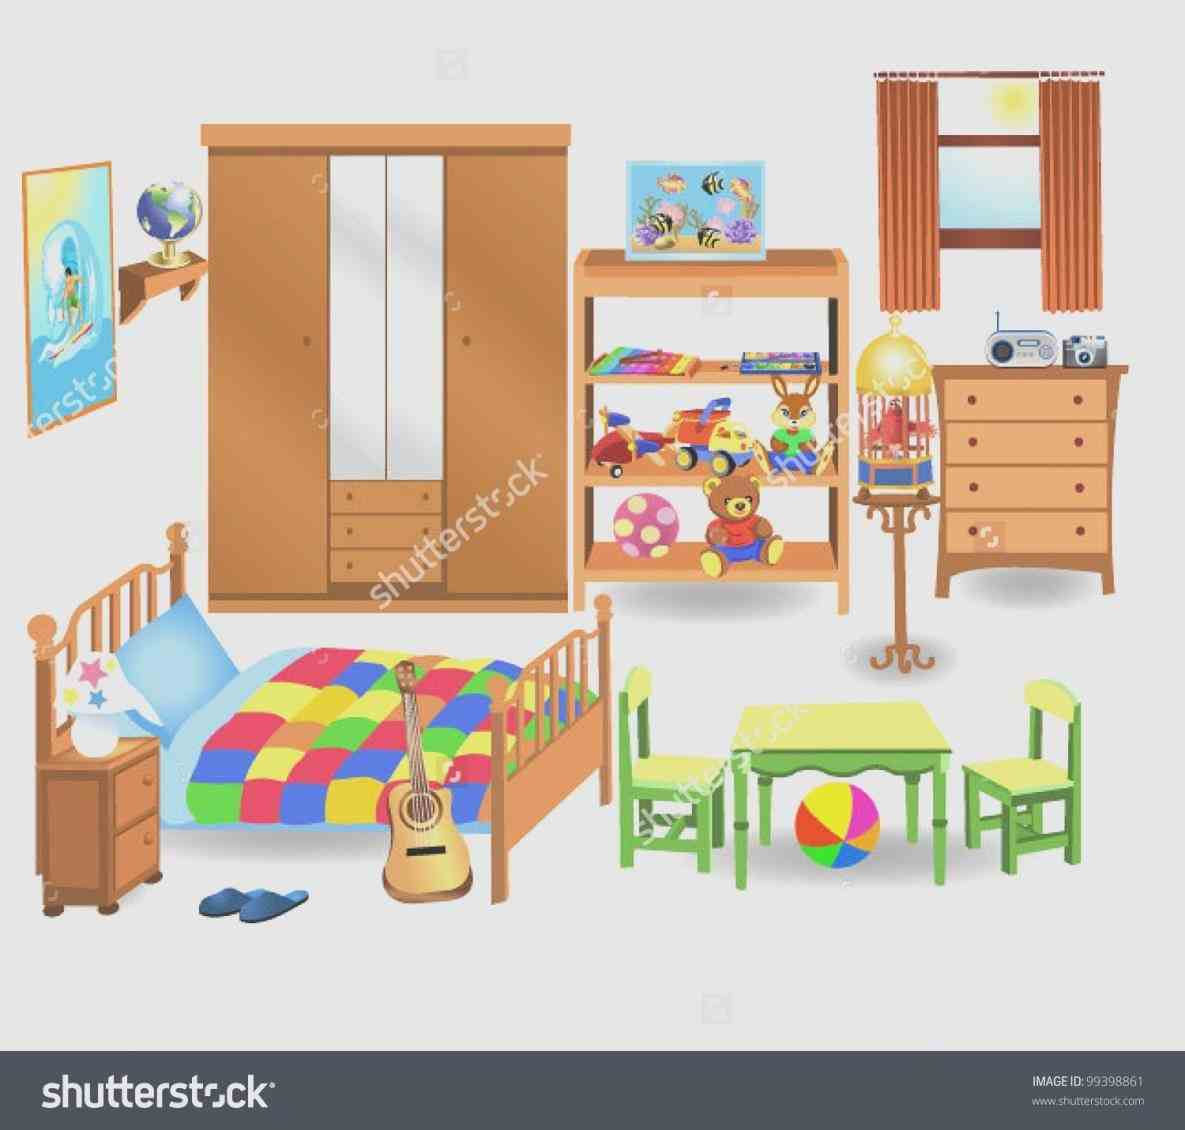 Bedroom clipart room decor. Deadanbreakfast com page power